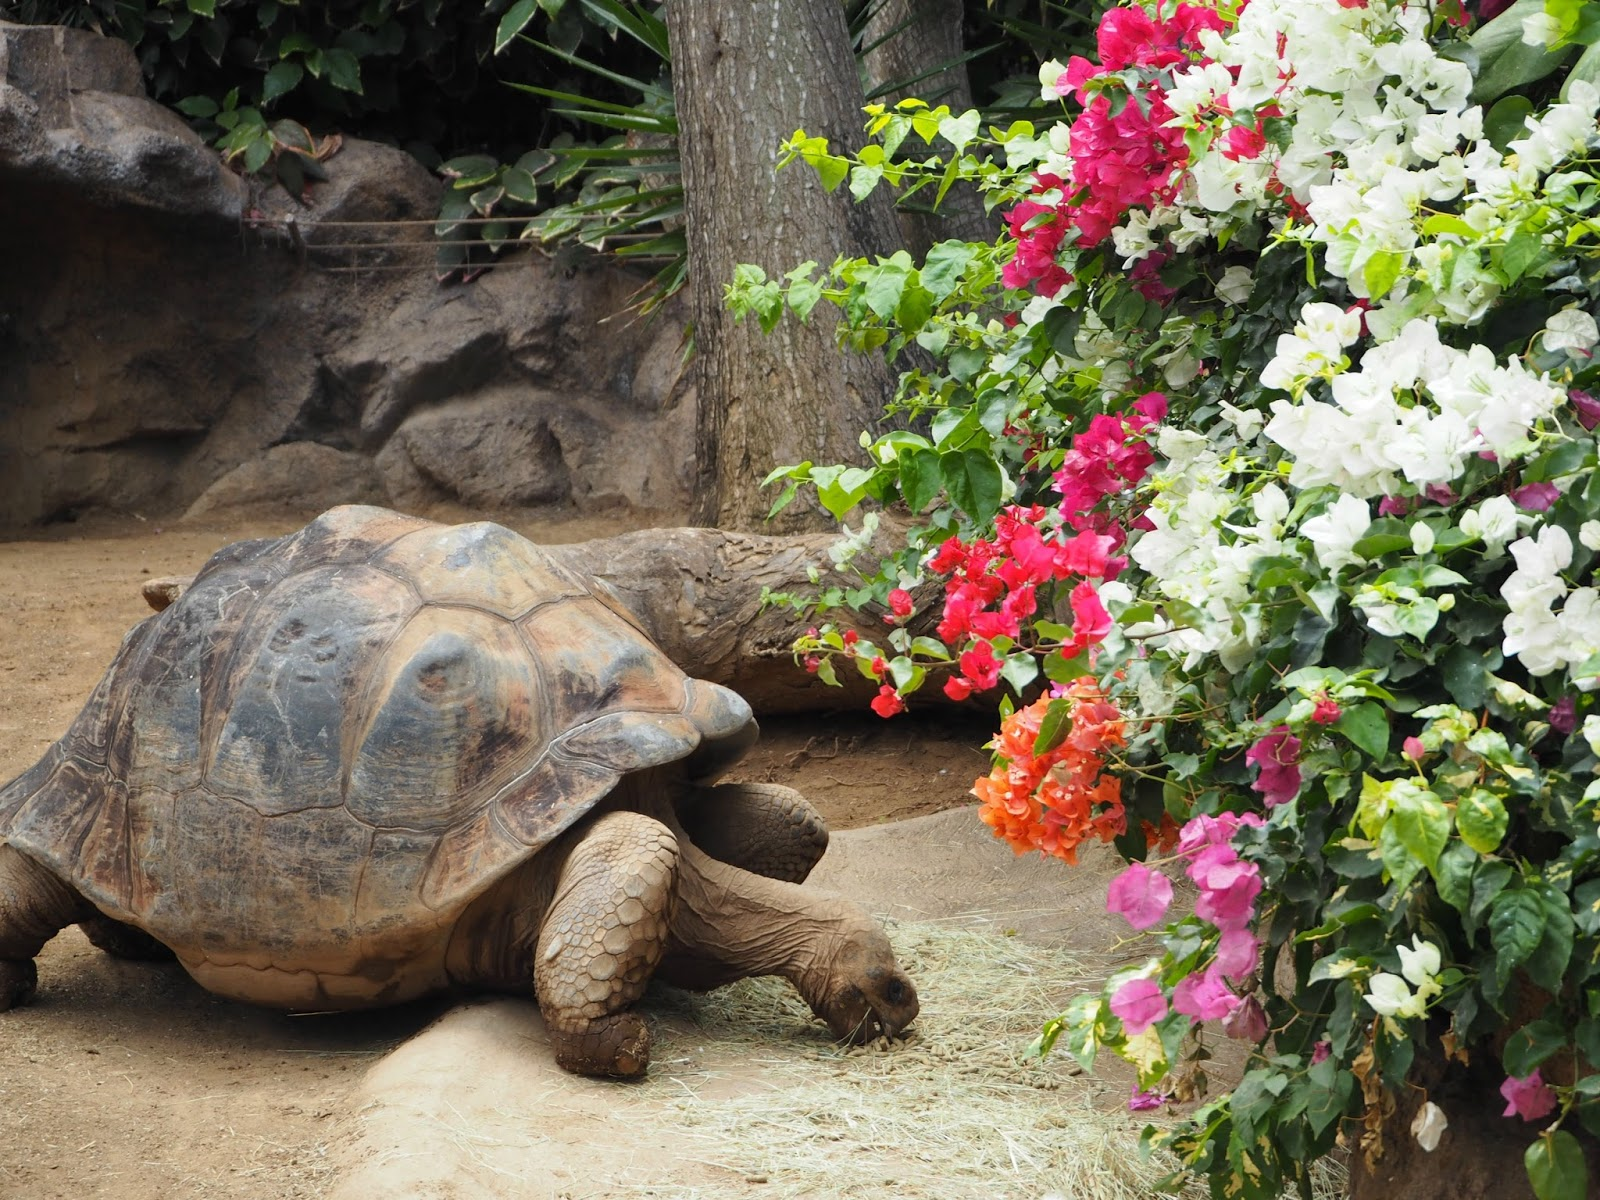 Giant turtle Loro Parque